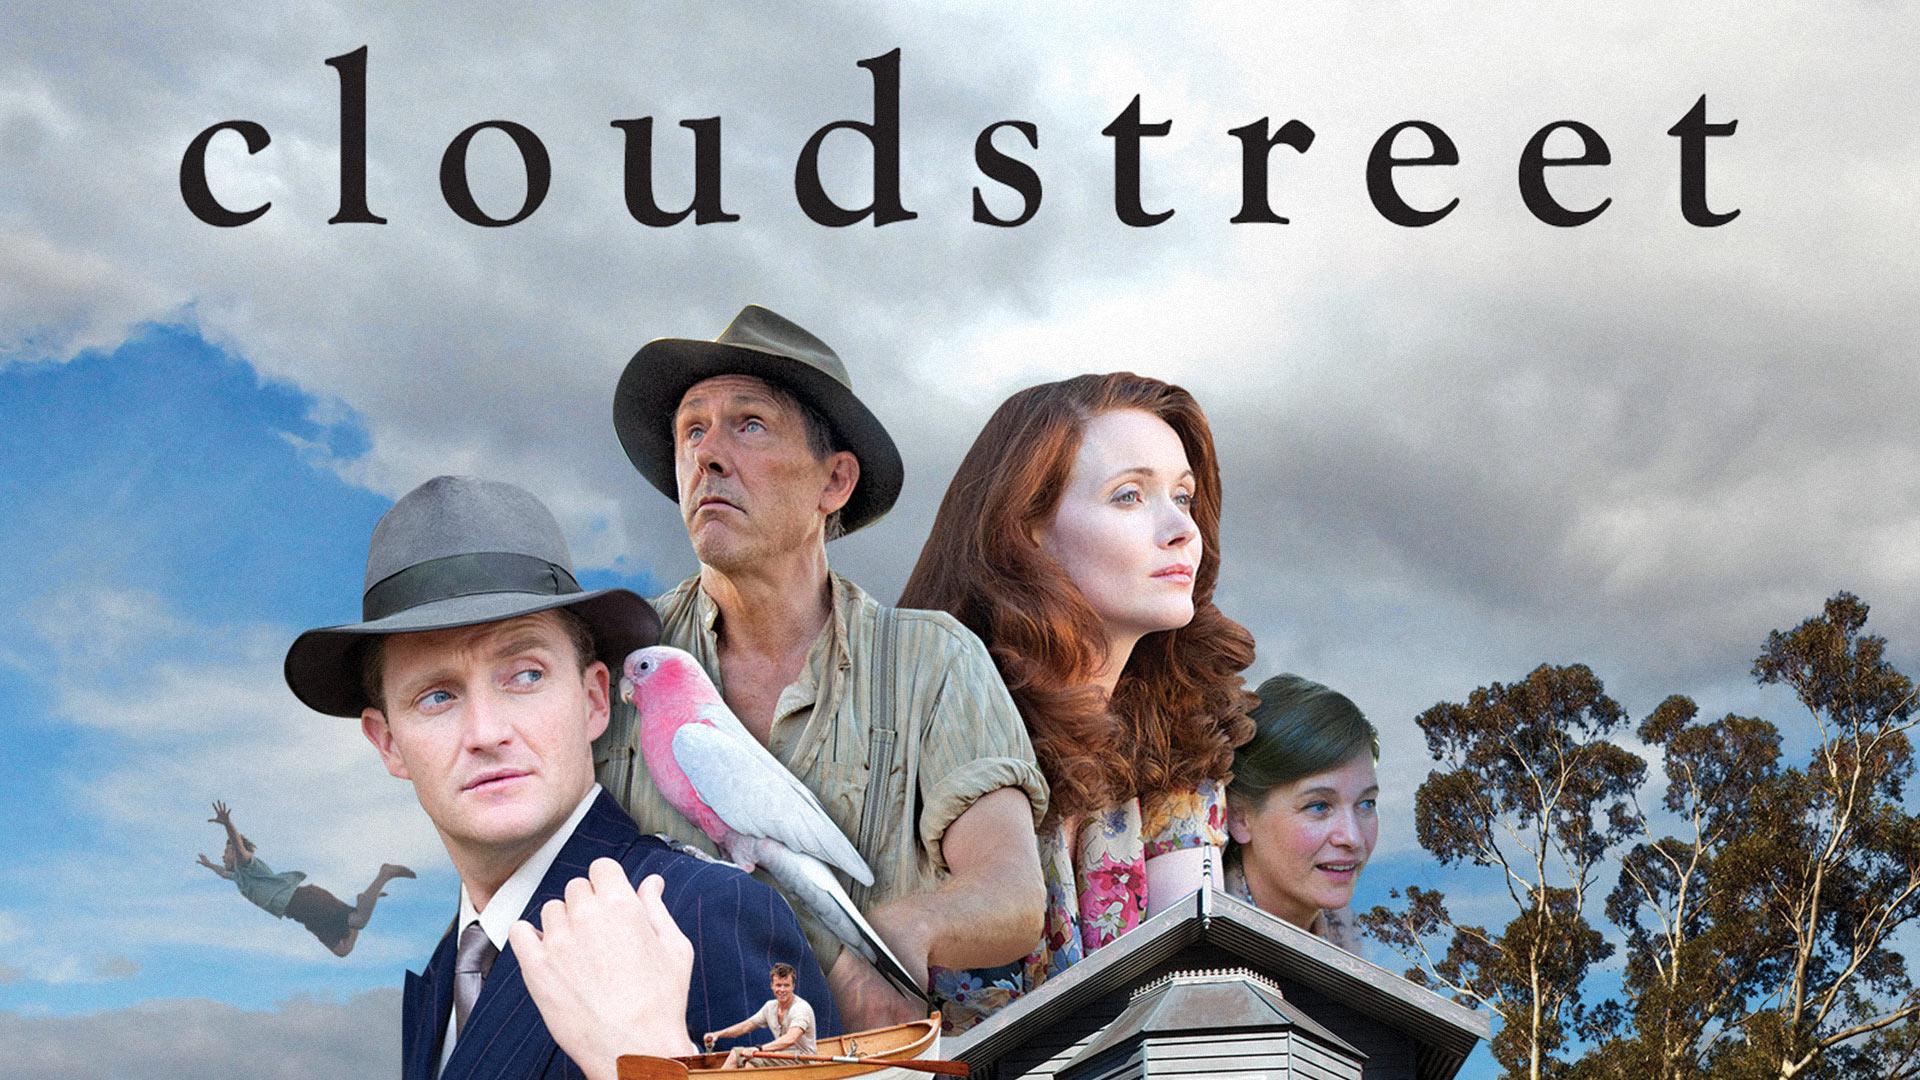 Cloudstreet Season 1